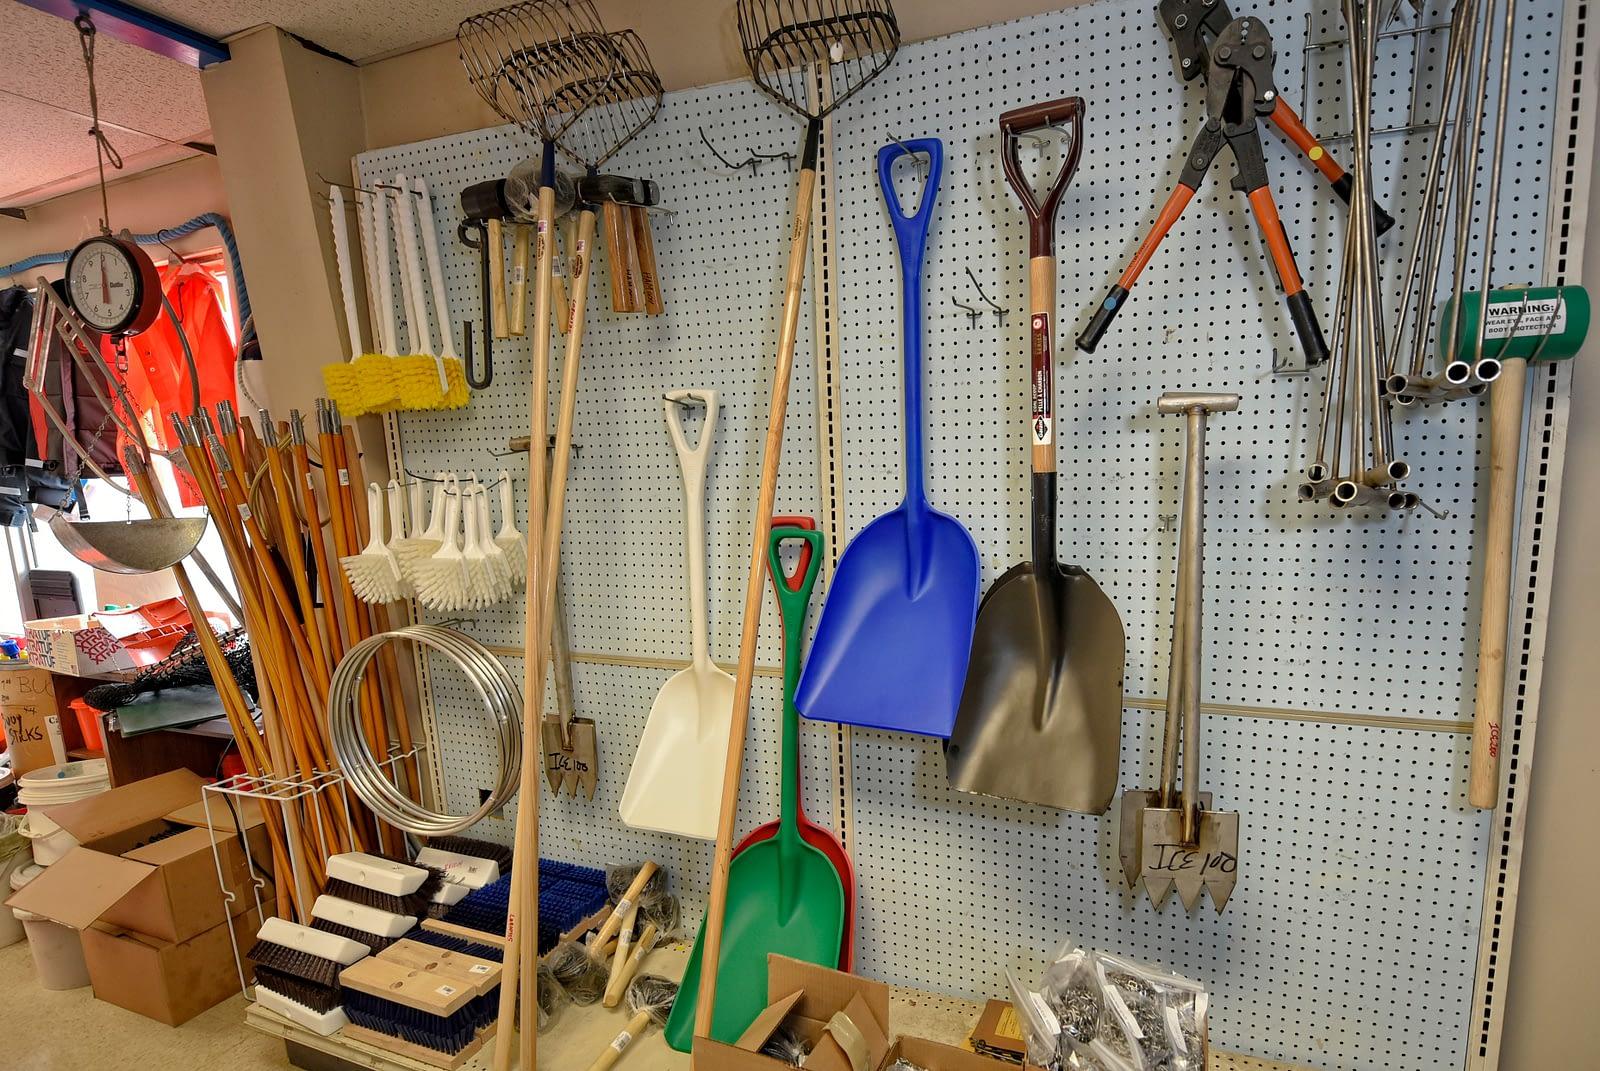 Fishing supplies and tools, Hercules Marine fishing supply company